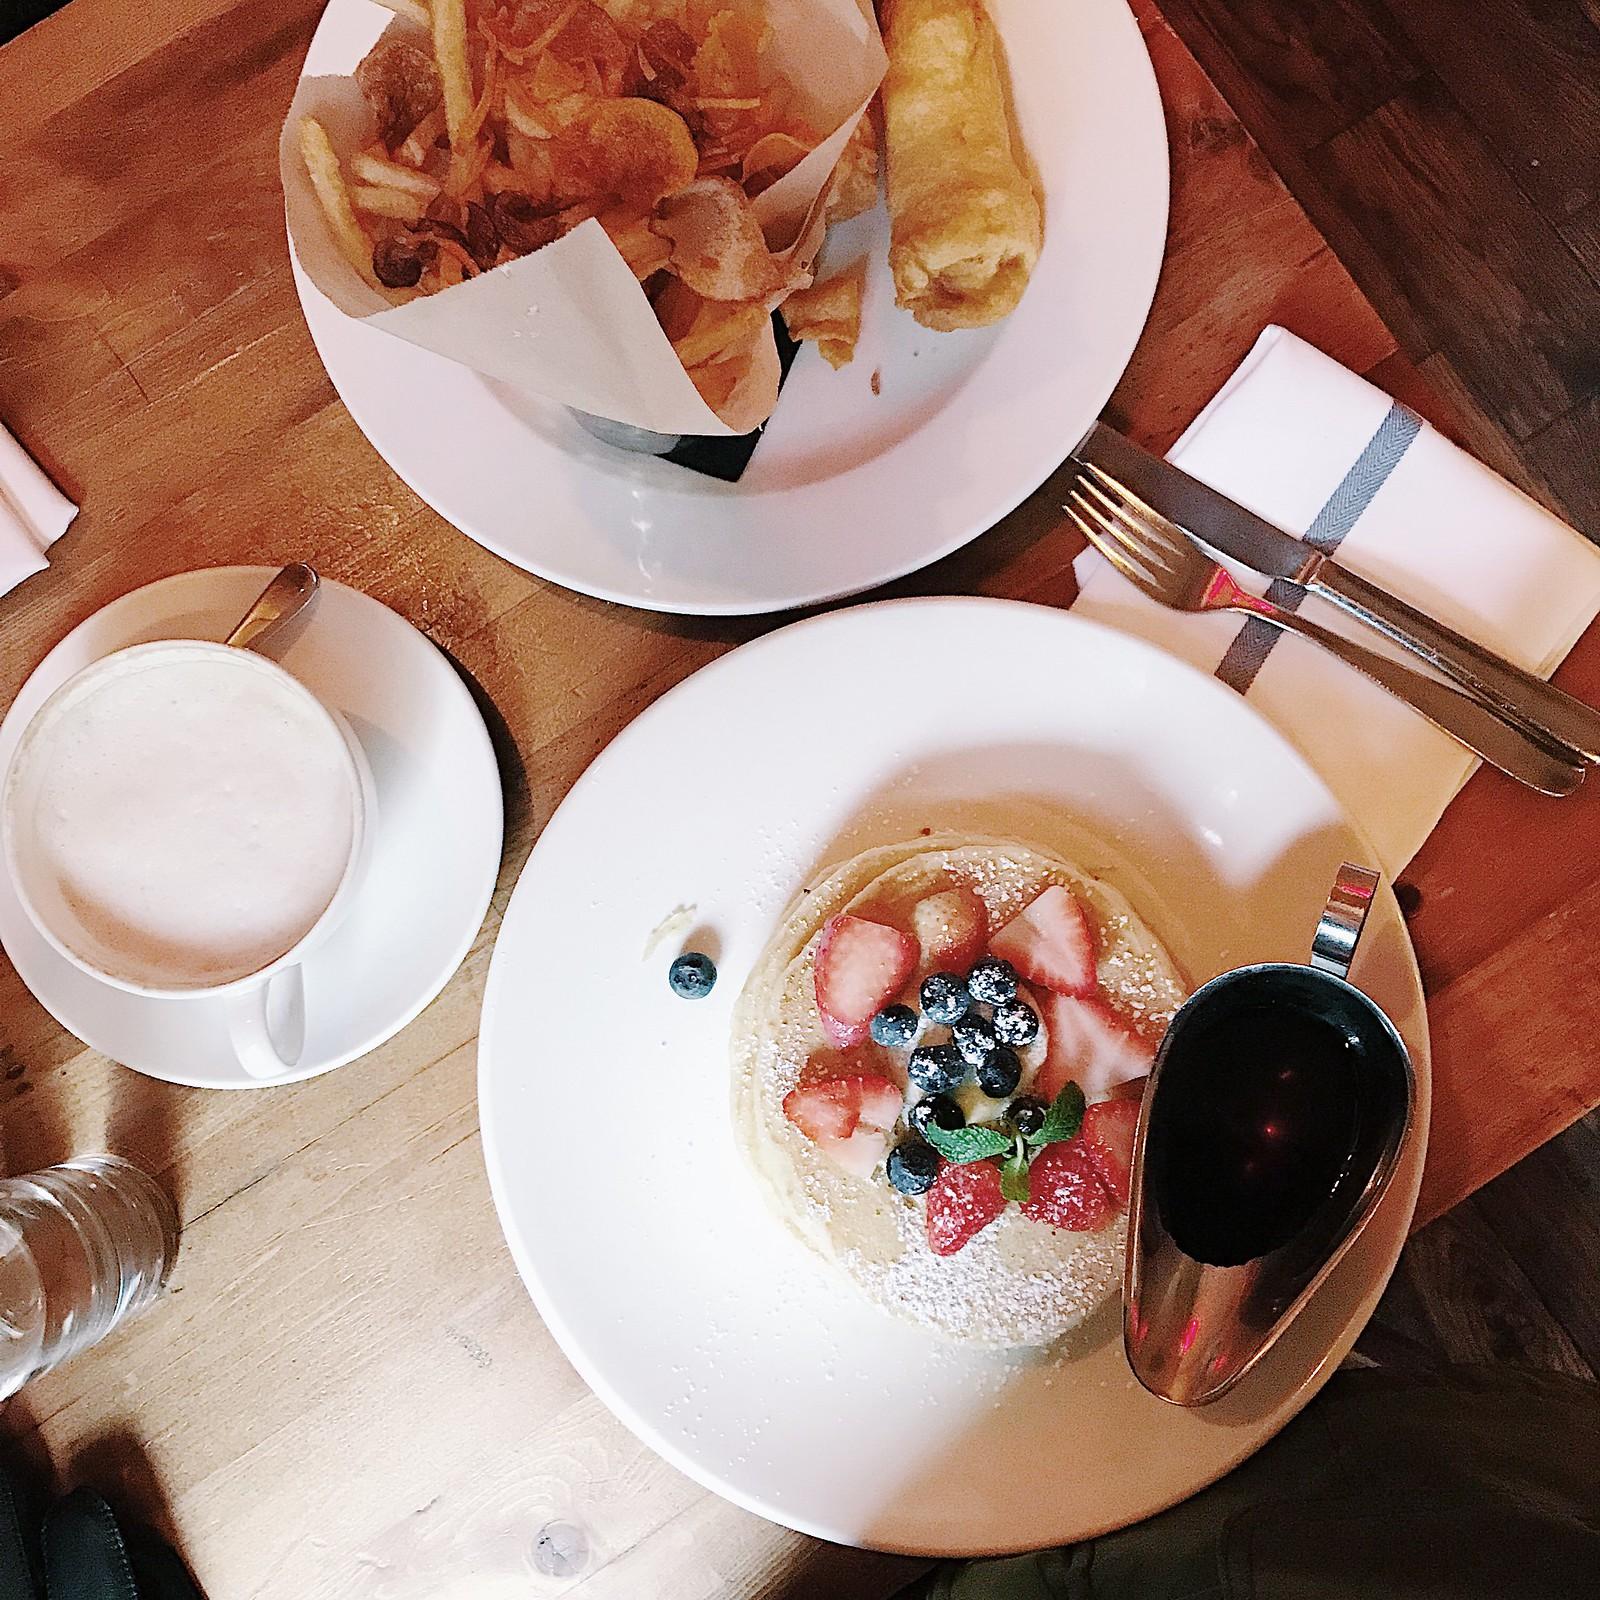 harold-brunch-breakfast-foodie-hipster-foodporn-nyc-newyorkcity-newyork-clothestoyouuu-elizabeeetht